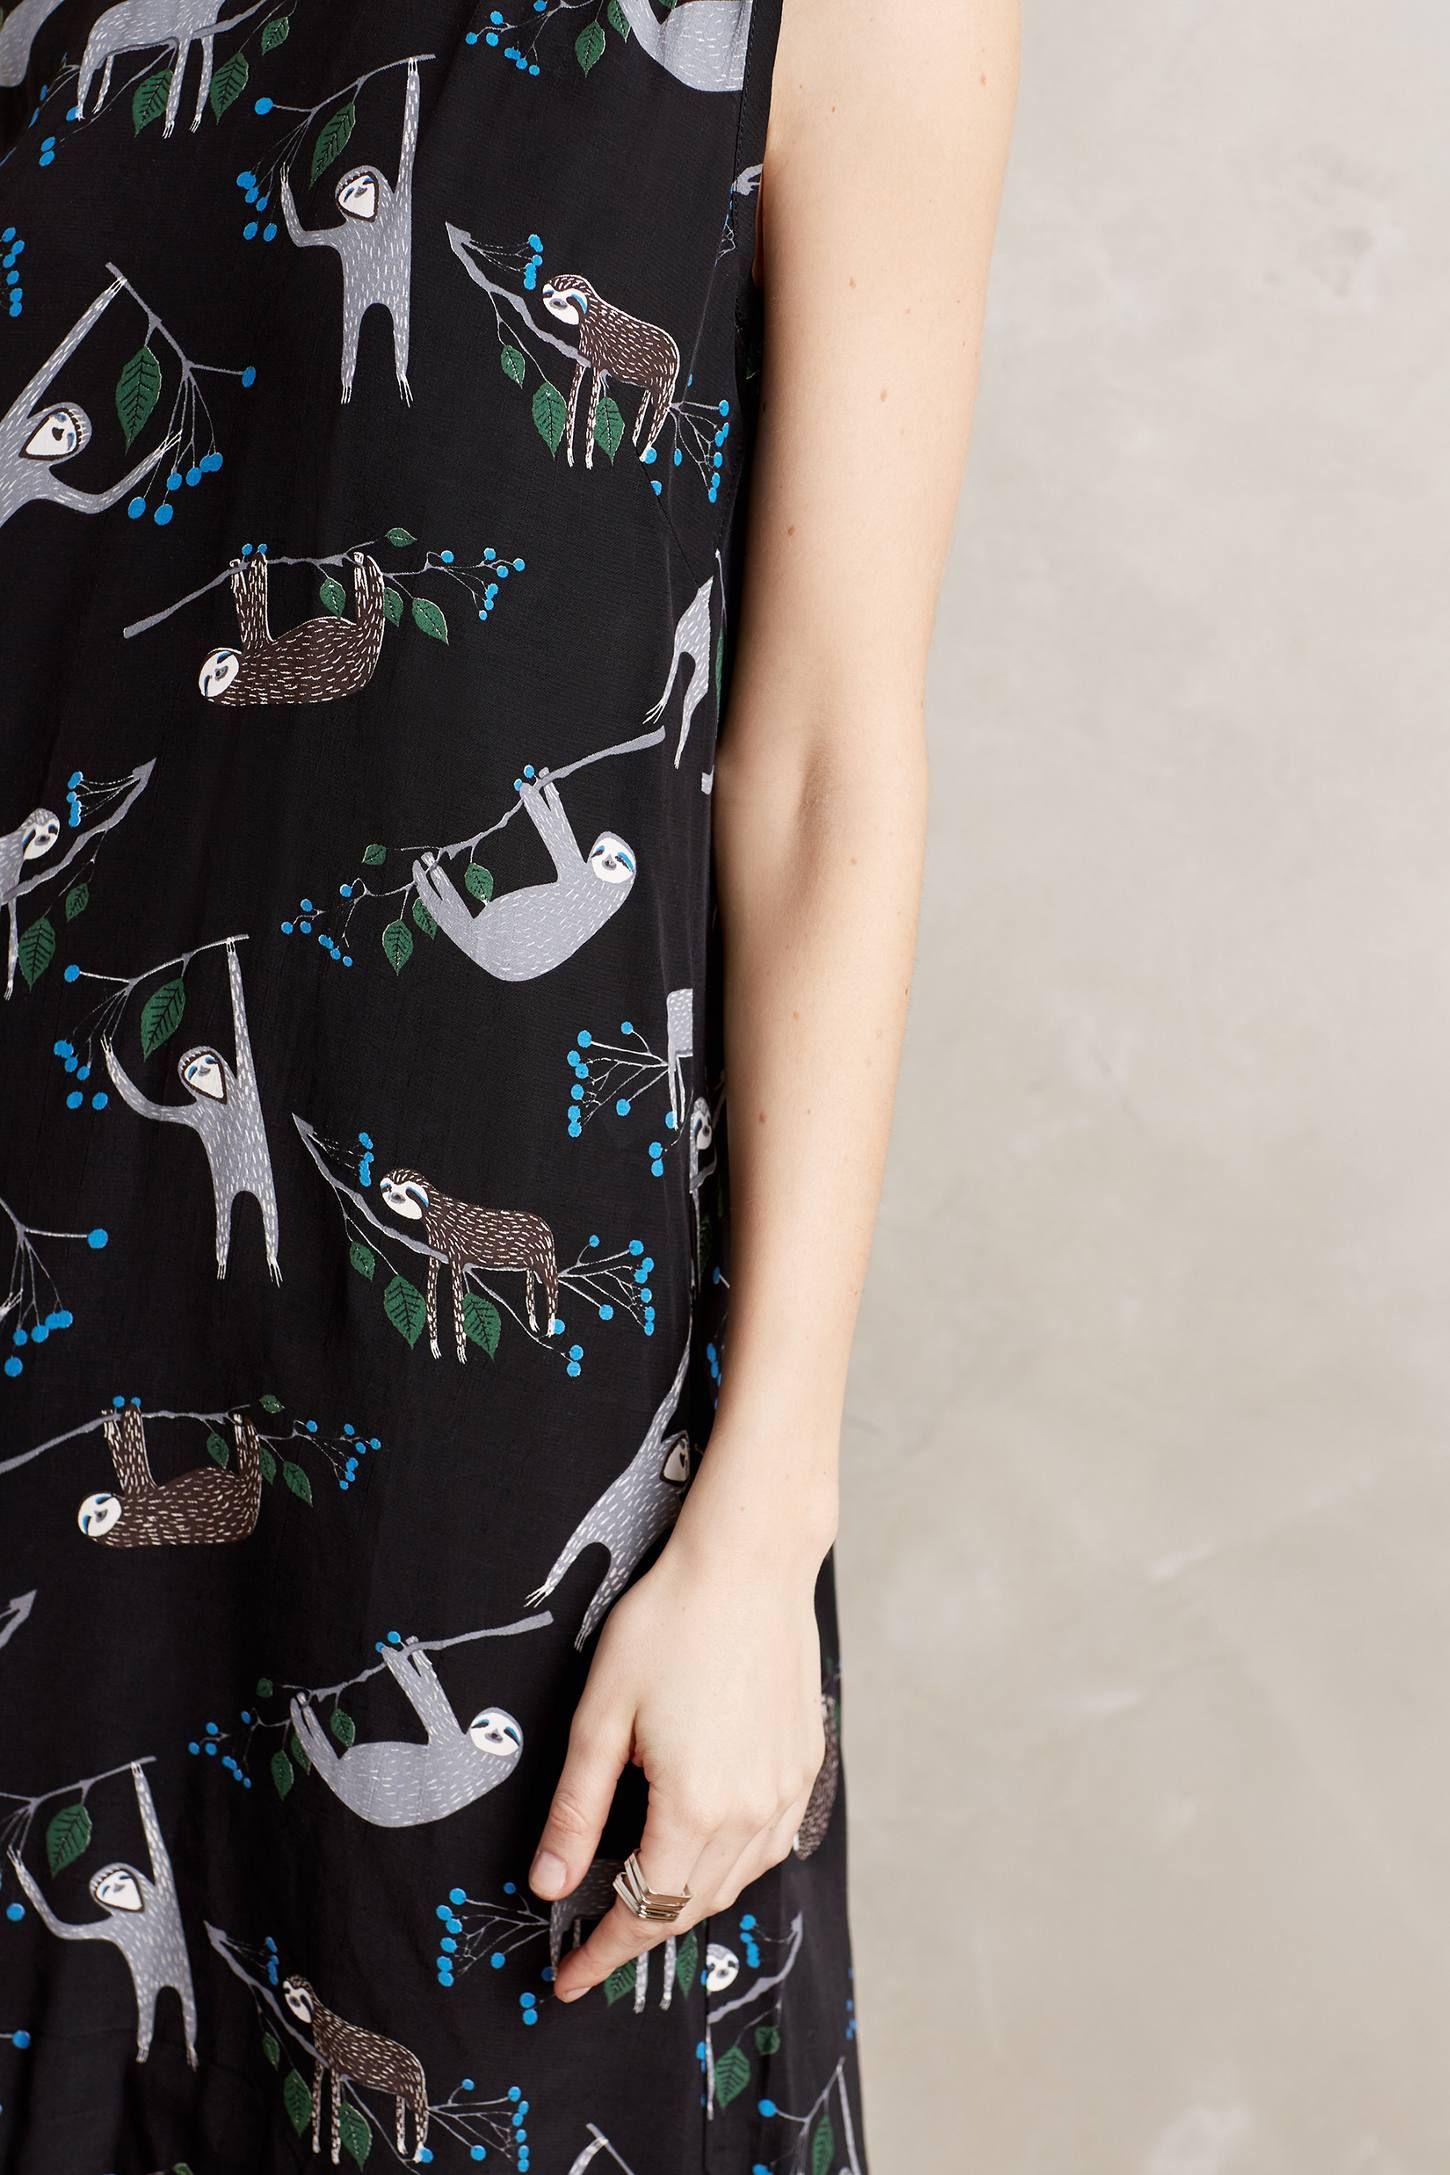 Sloth Swing Dress